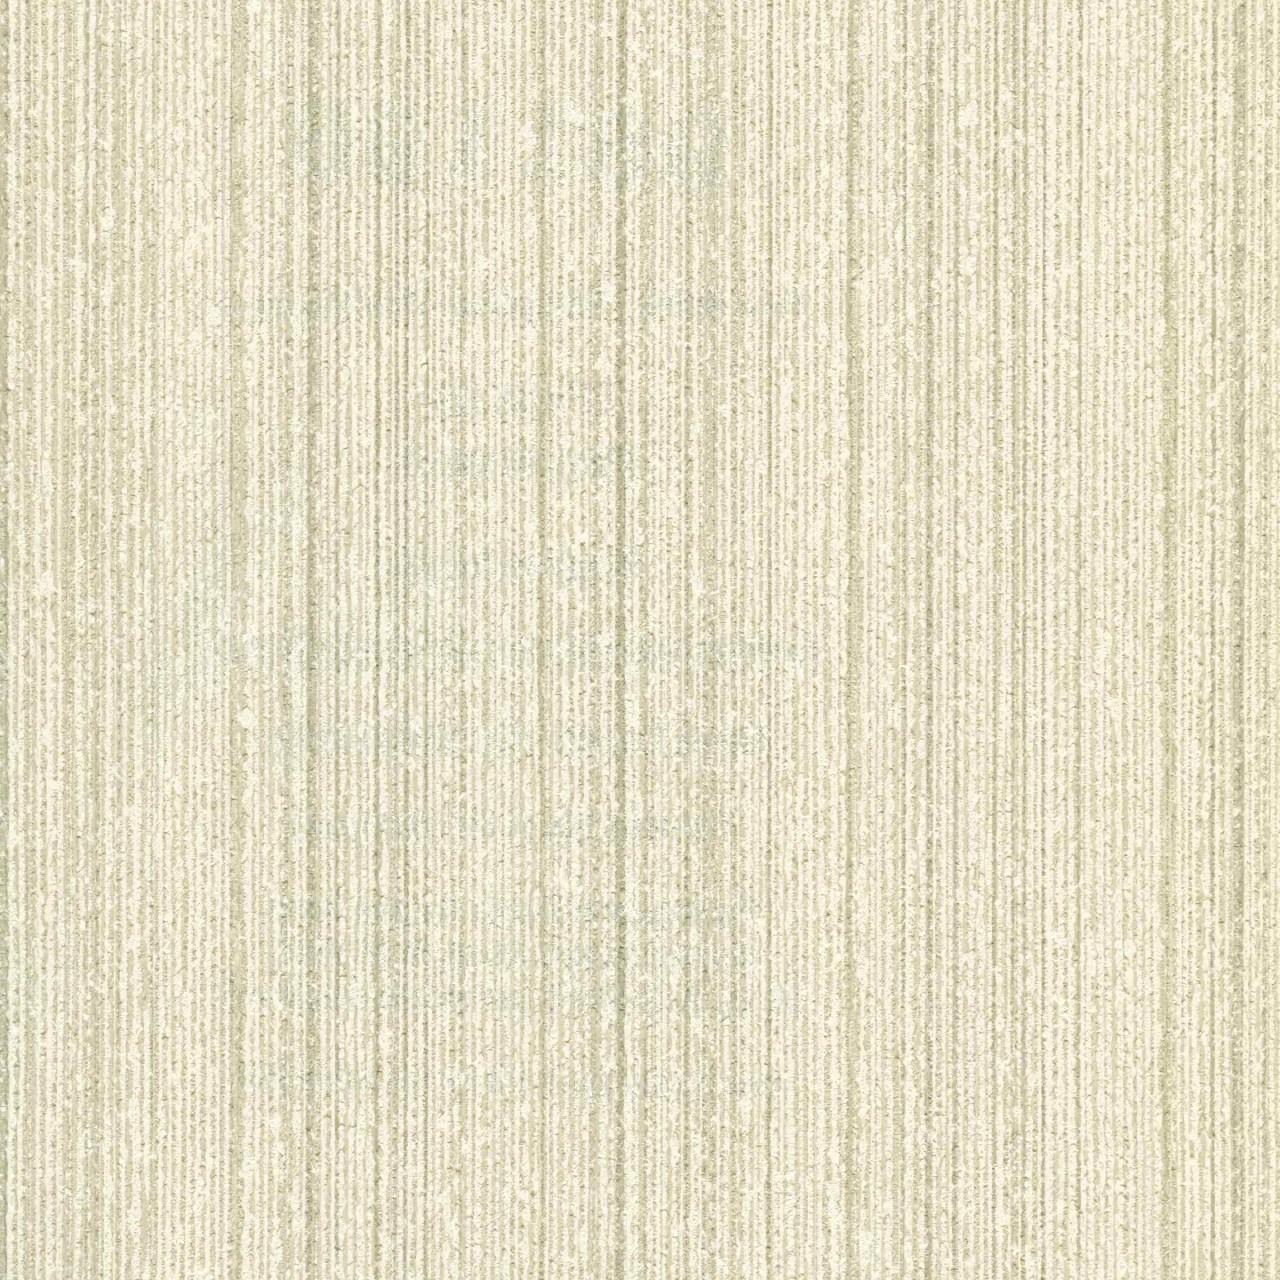 Fabric Wall Paper : Fabric wallpaper wallpapers adorable